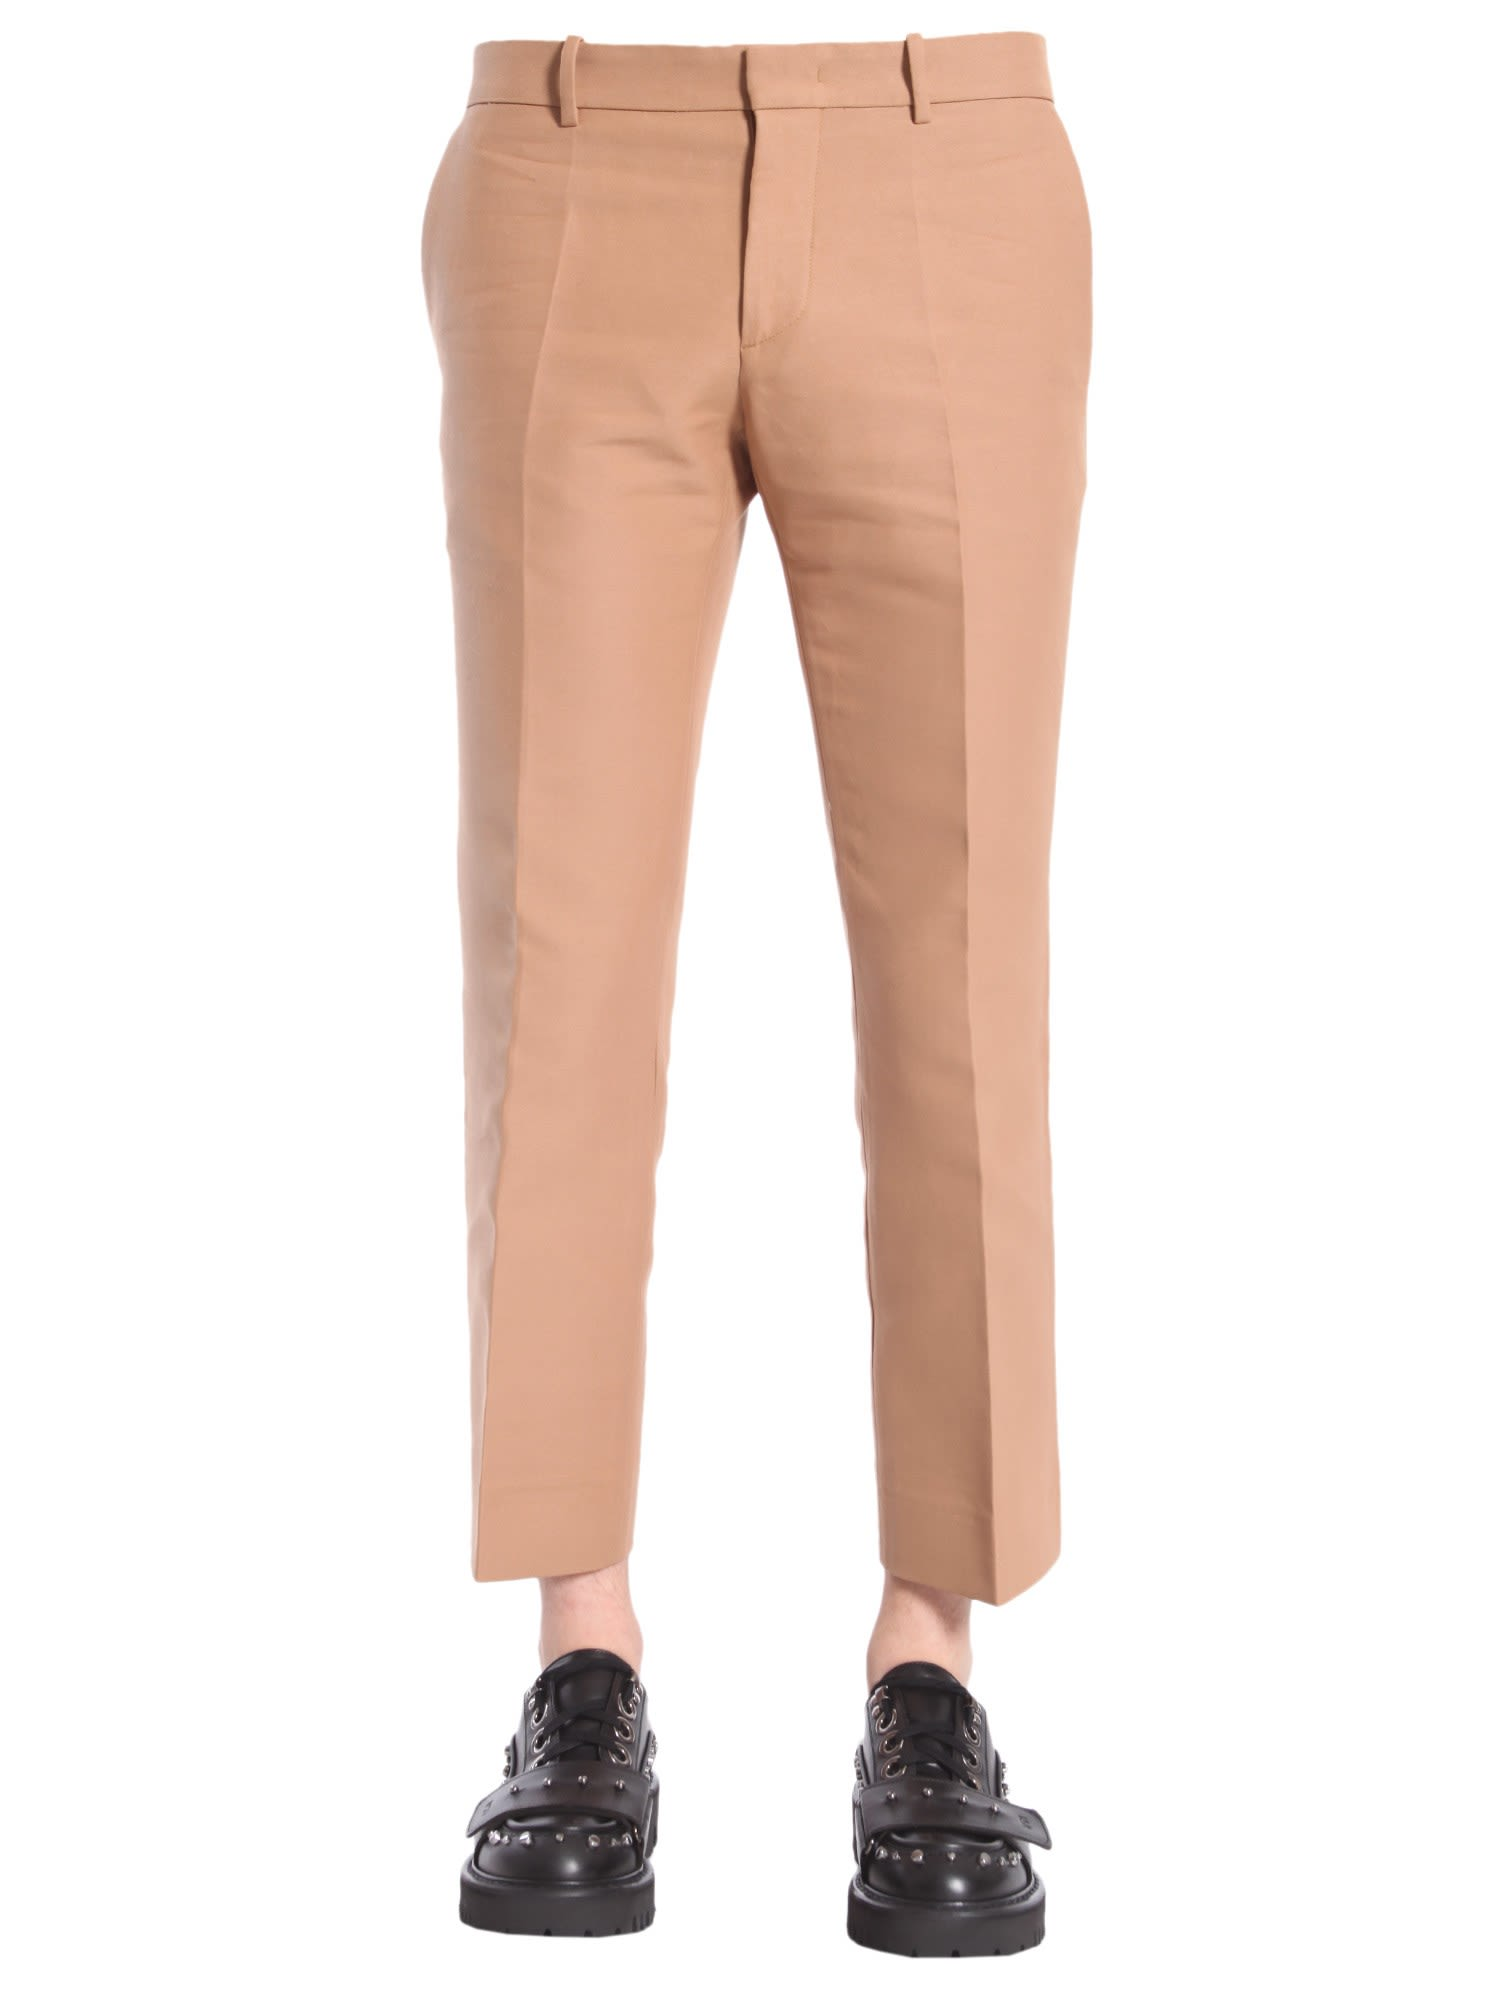 Kick Flare Trousers